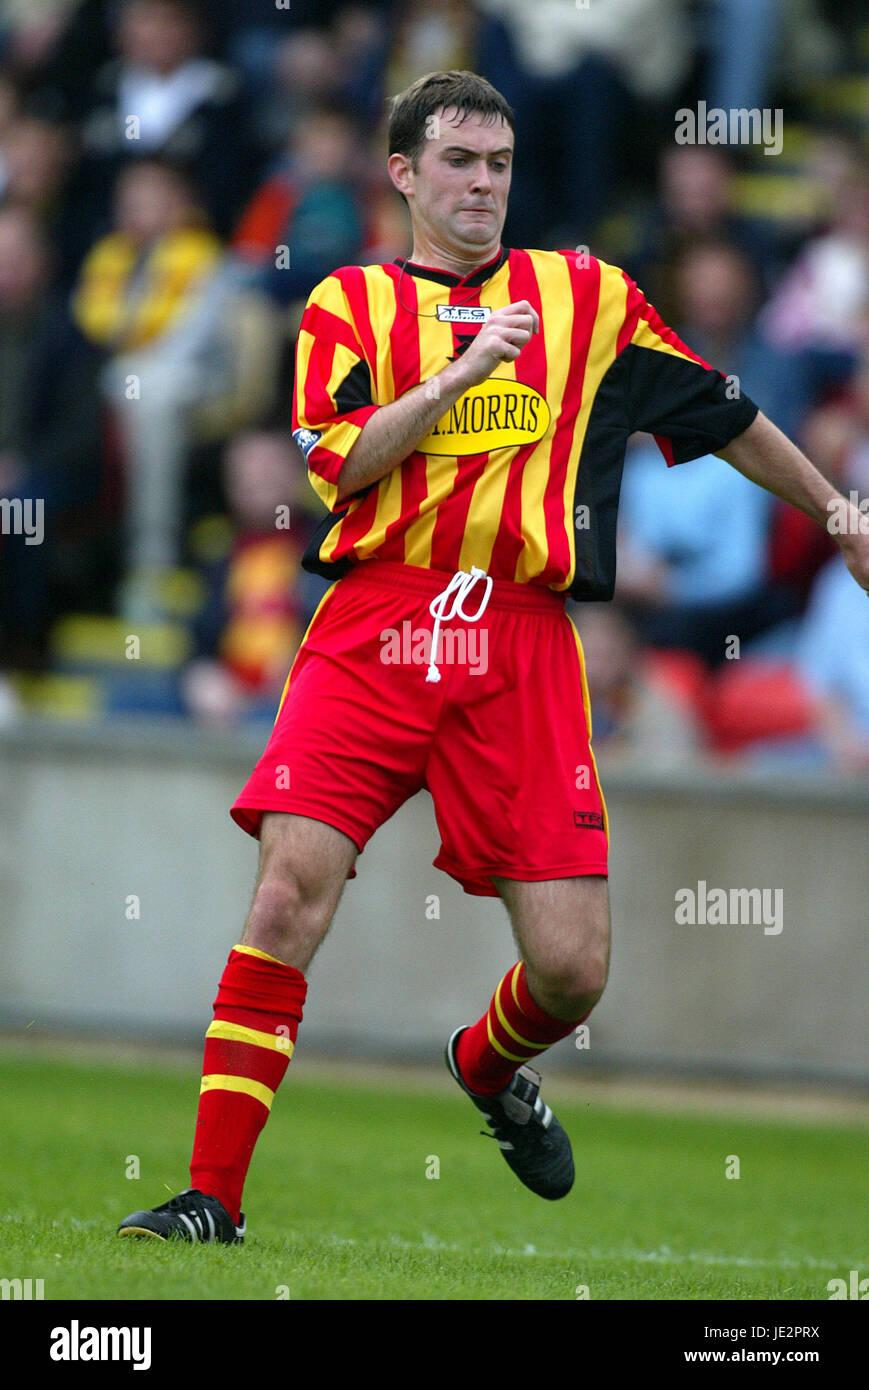 JAMES MCKINSTRY PARTICK THISTLE FC FIRHILL GLASGOW SCOTLAND 03 August 2002 - Stock Image